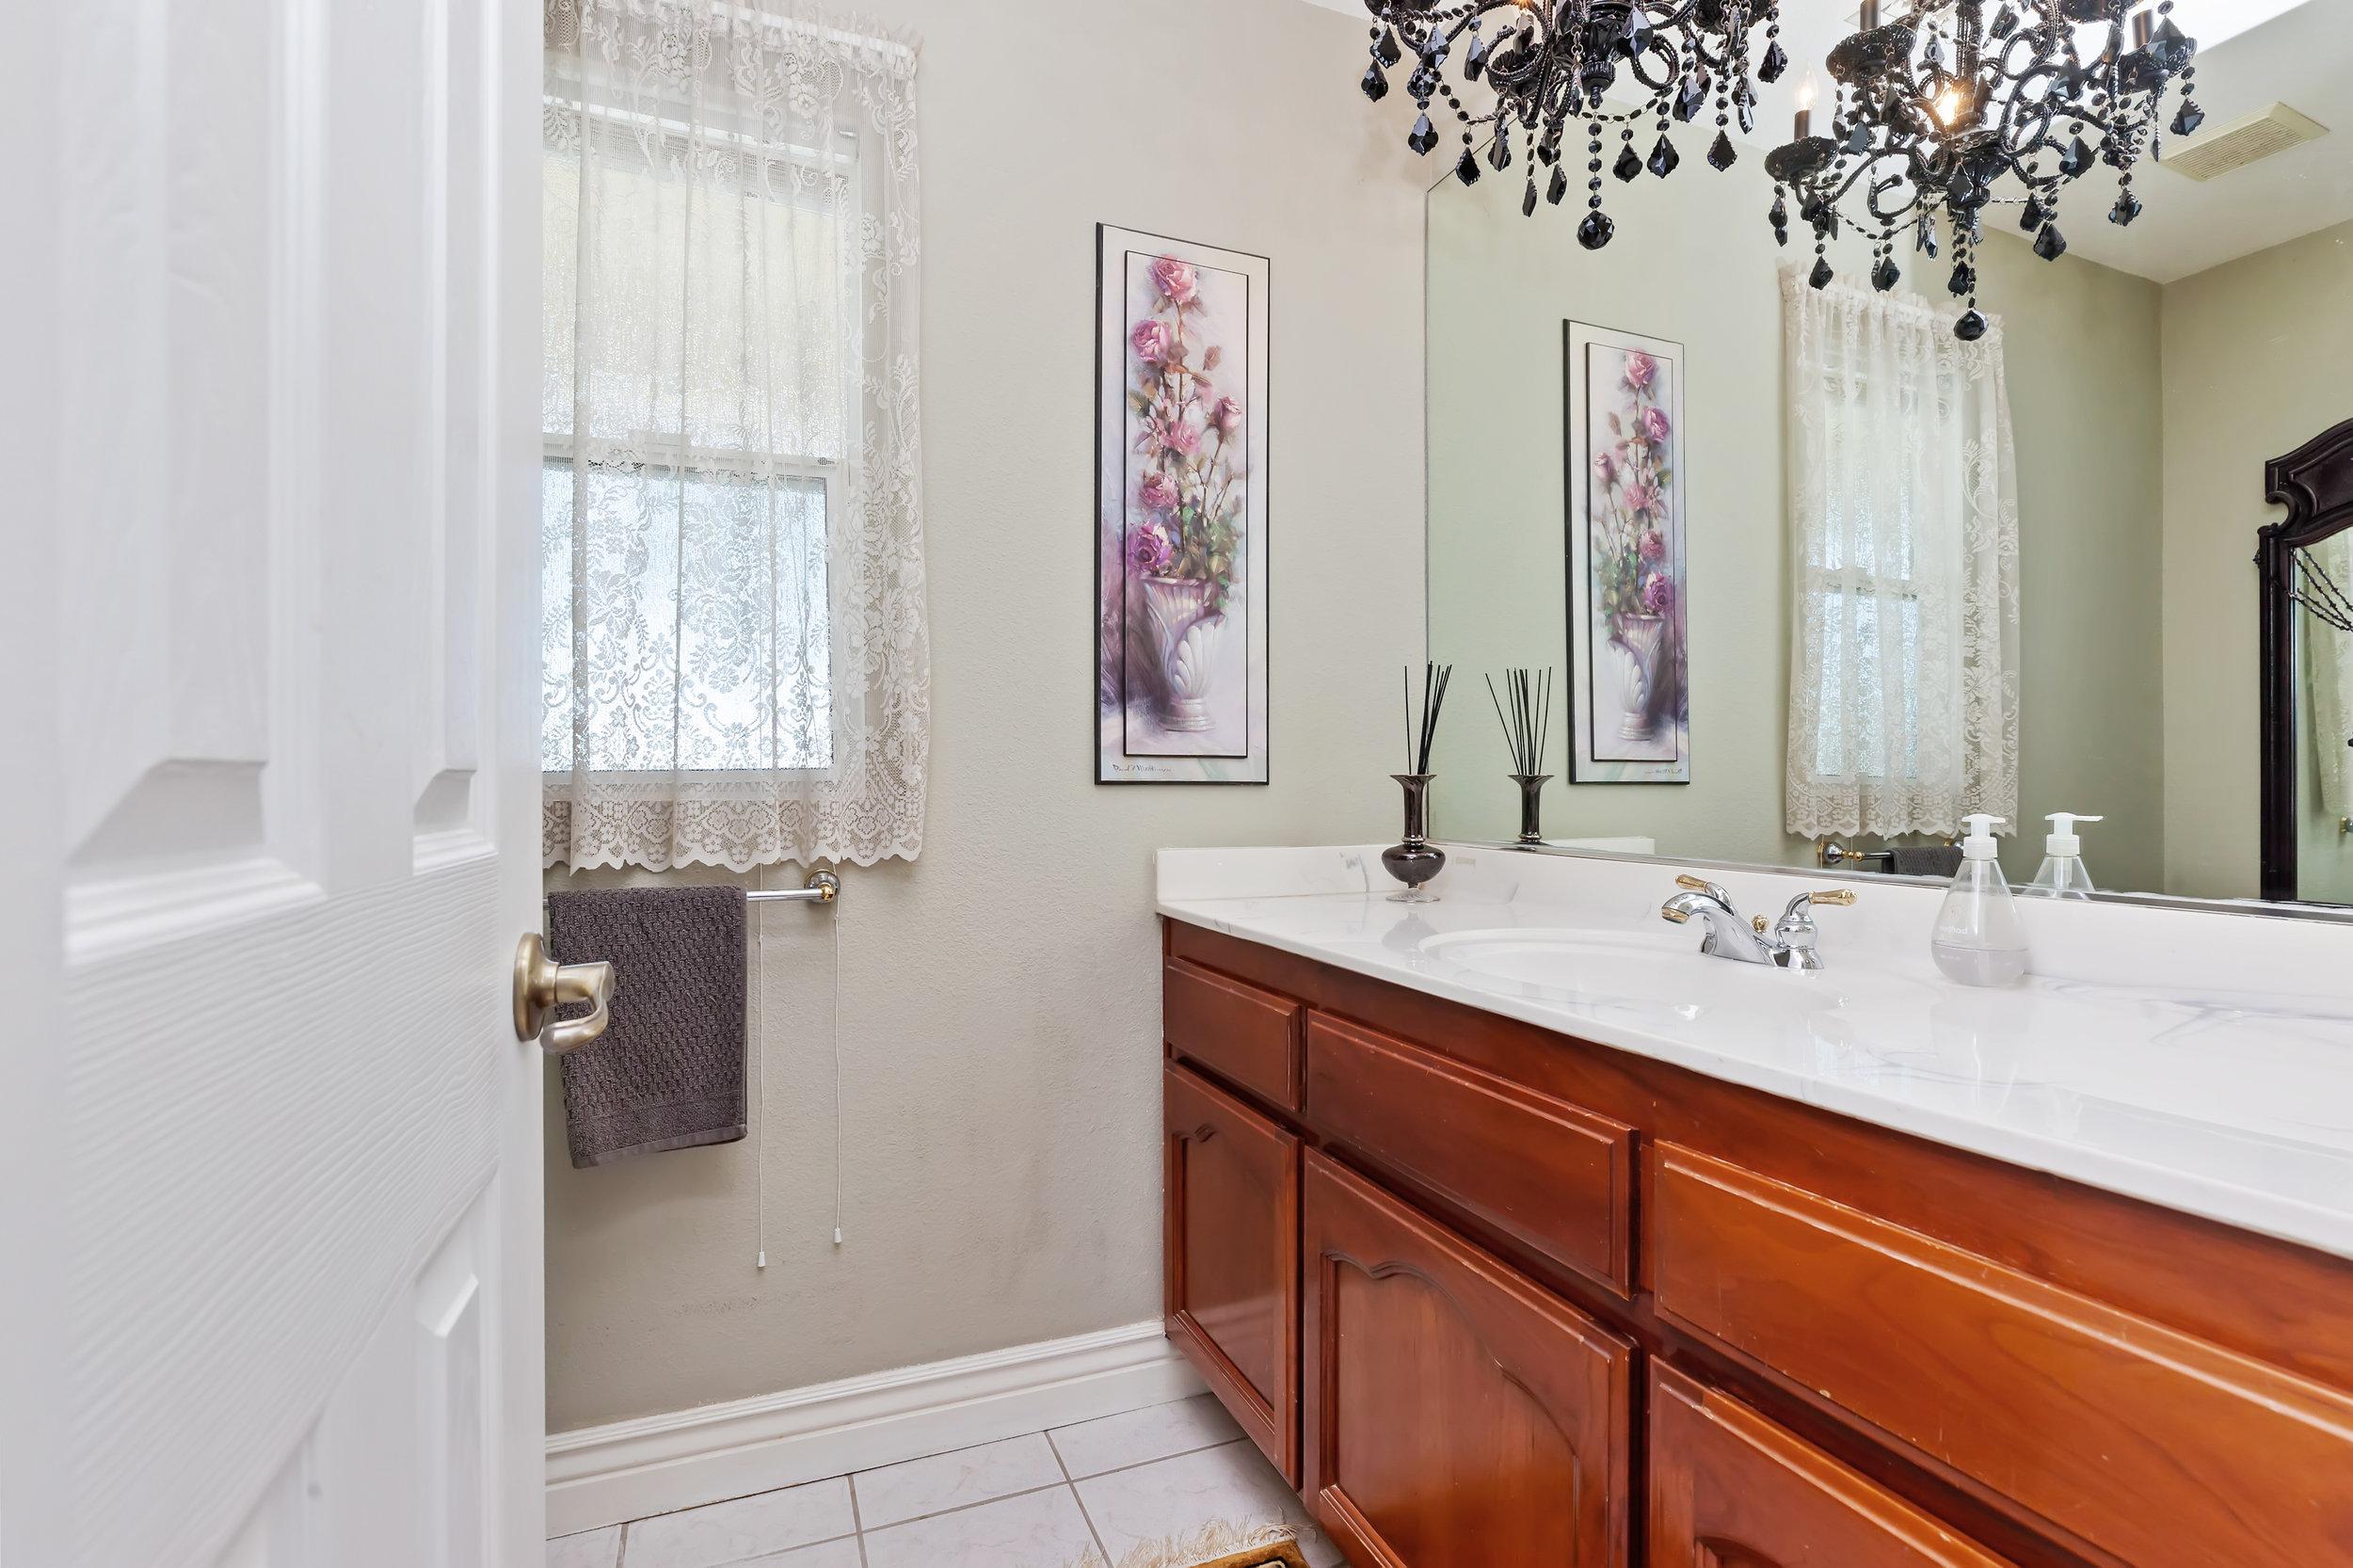 041_Bathroom.jpg